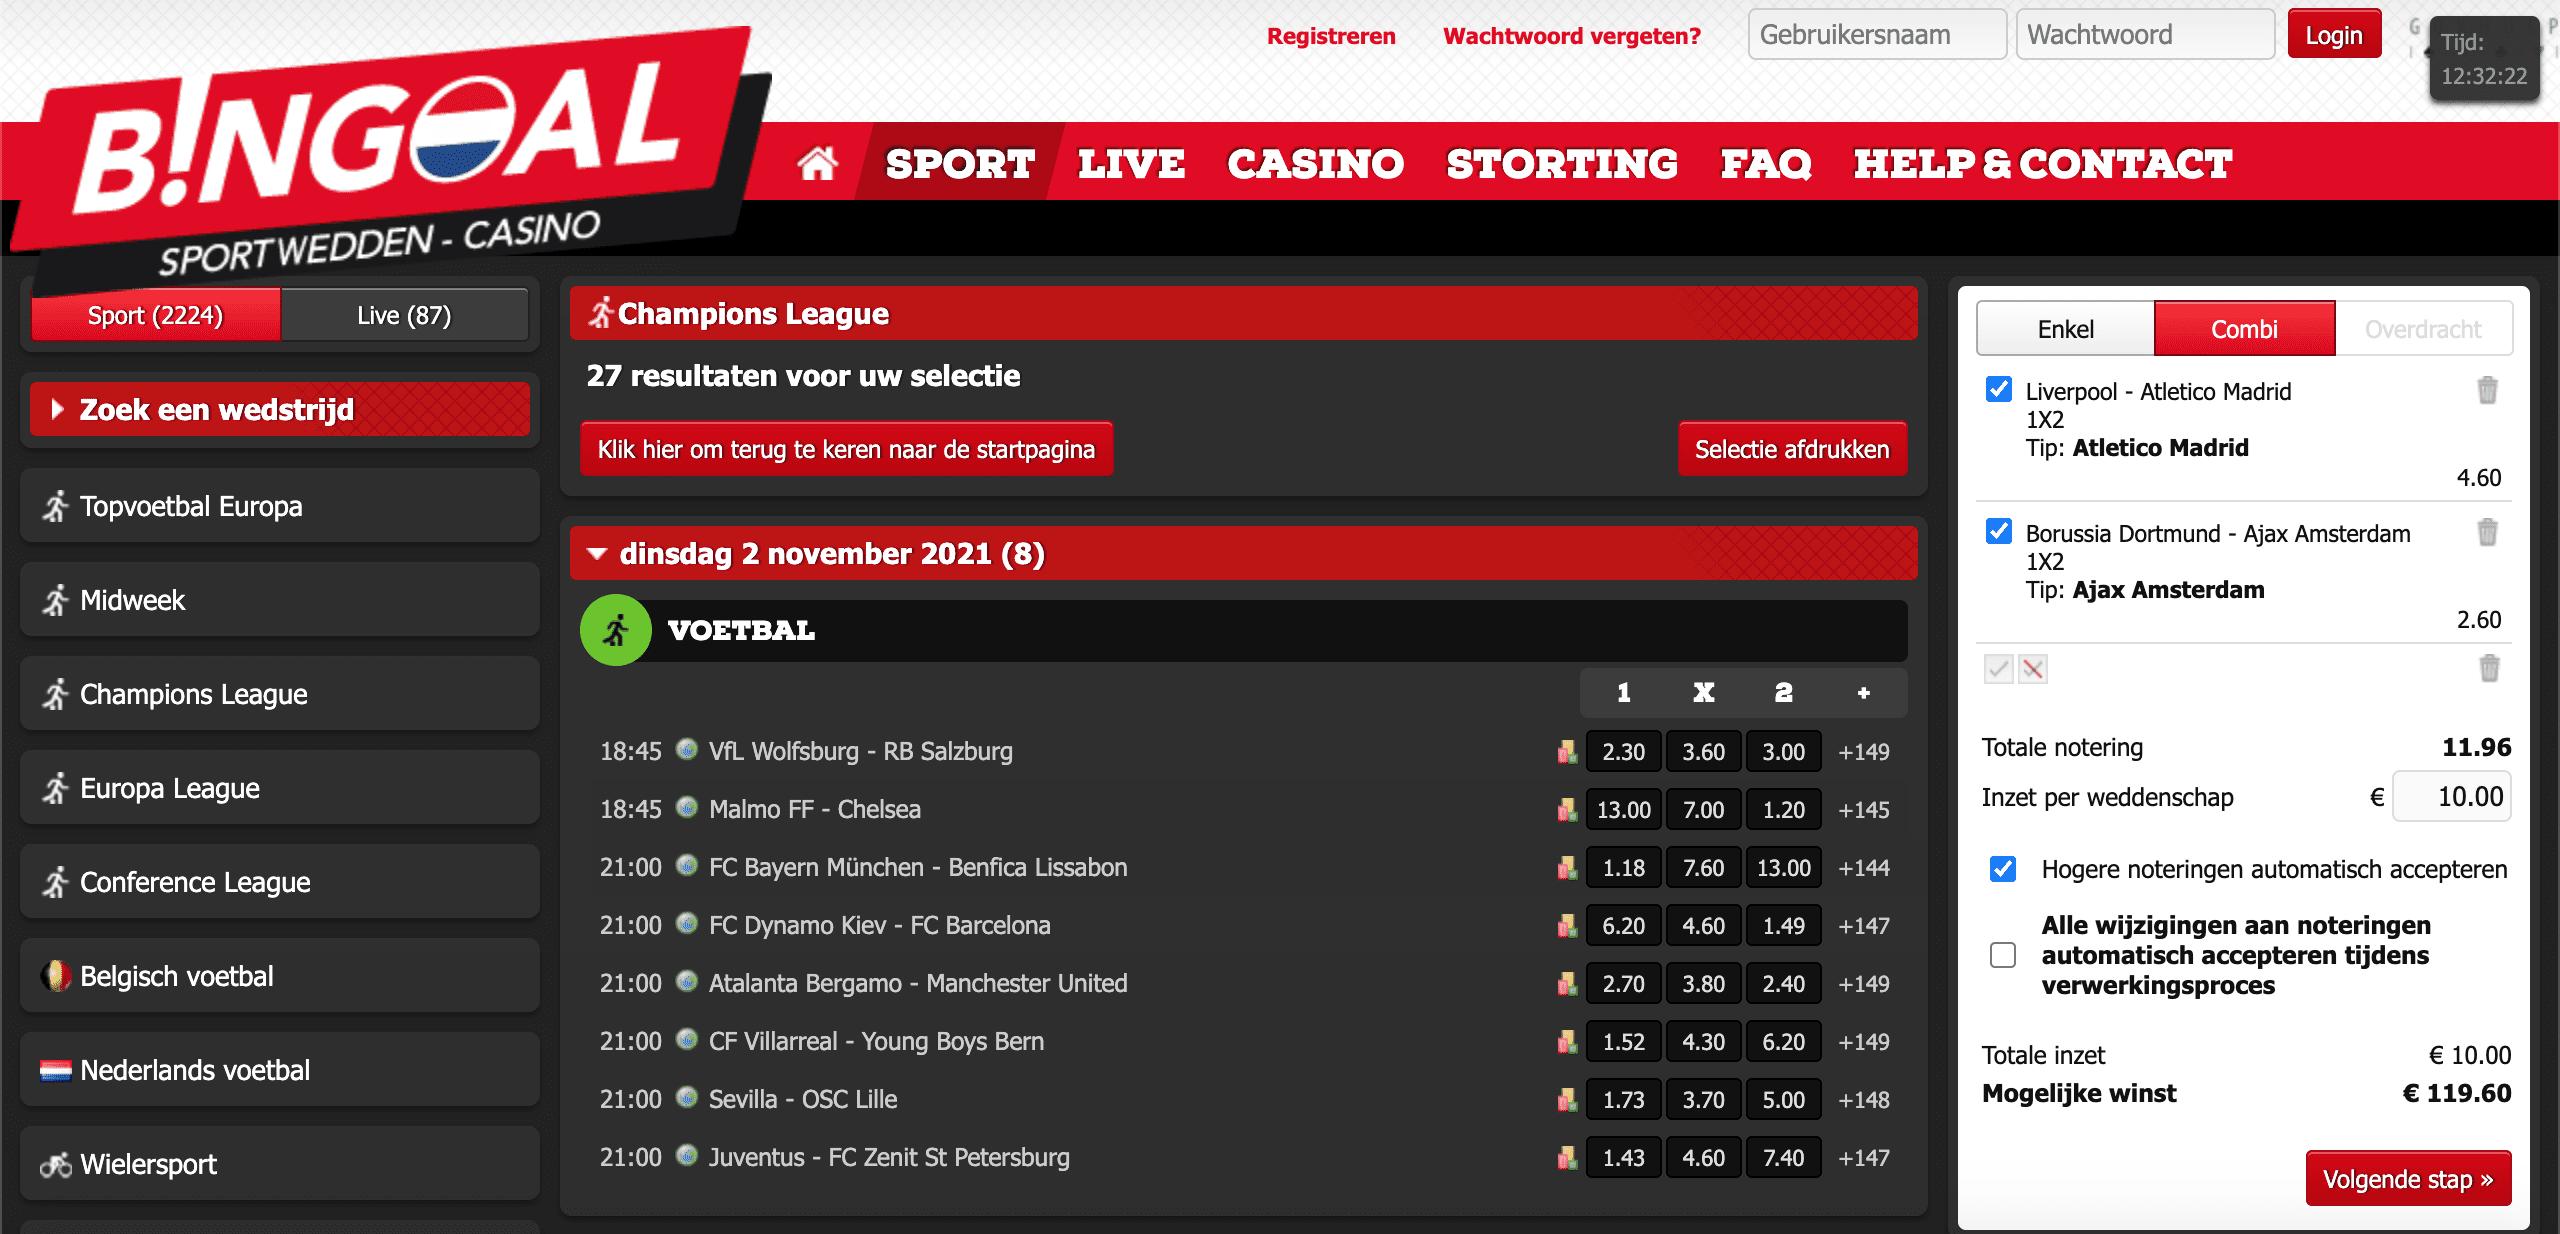 Bingoal landing page Nederland, sportwedden champions league